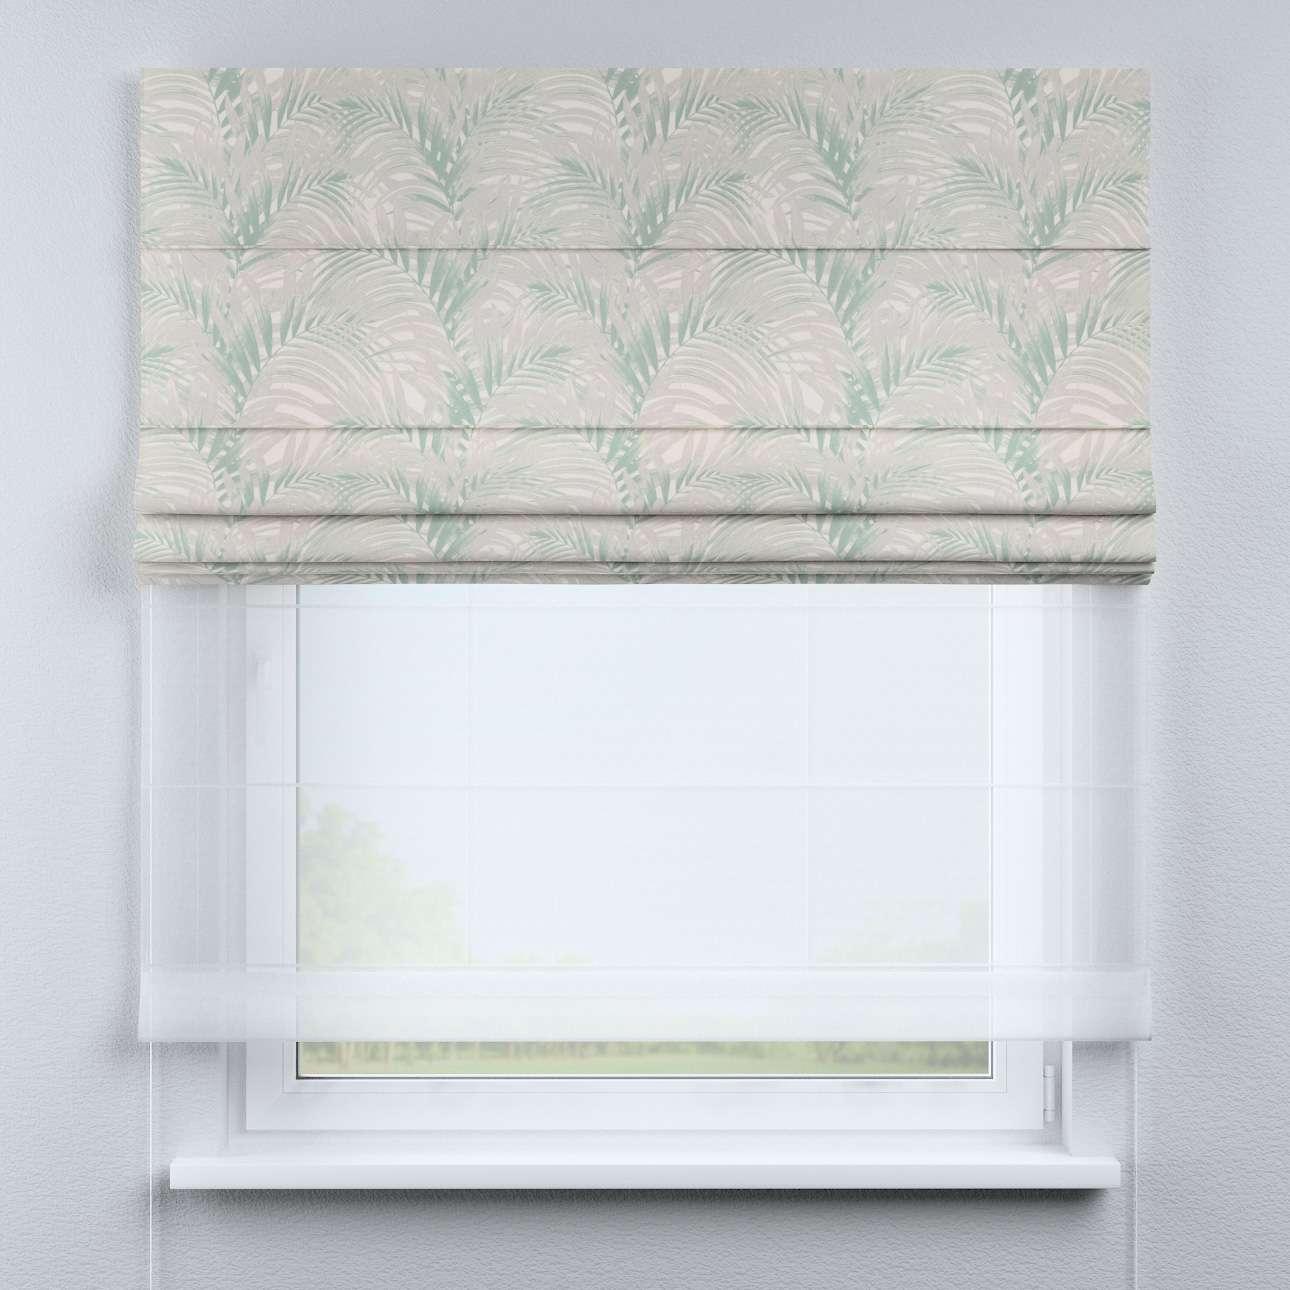 Rímska DUO roleta II V kolekcii Gardenia, tkanina: 142-15